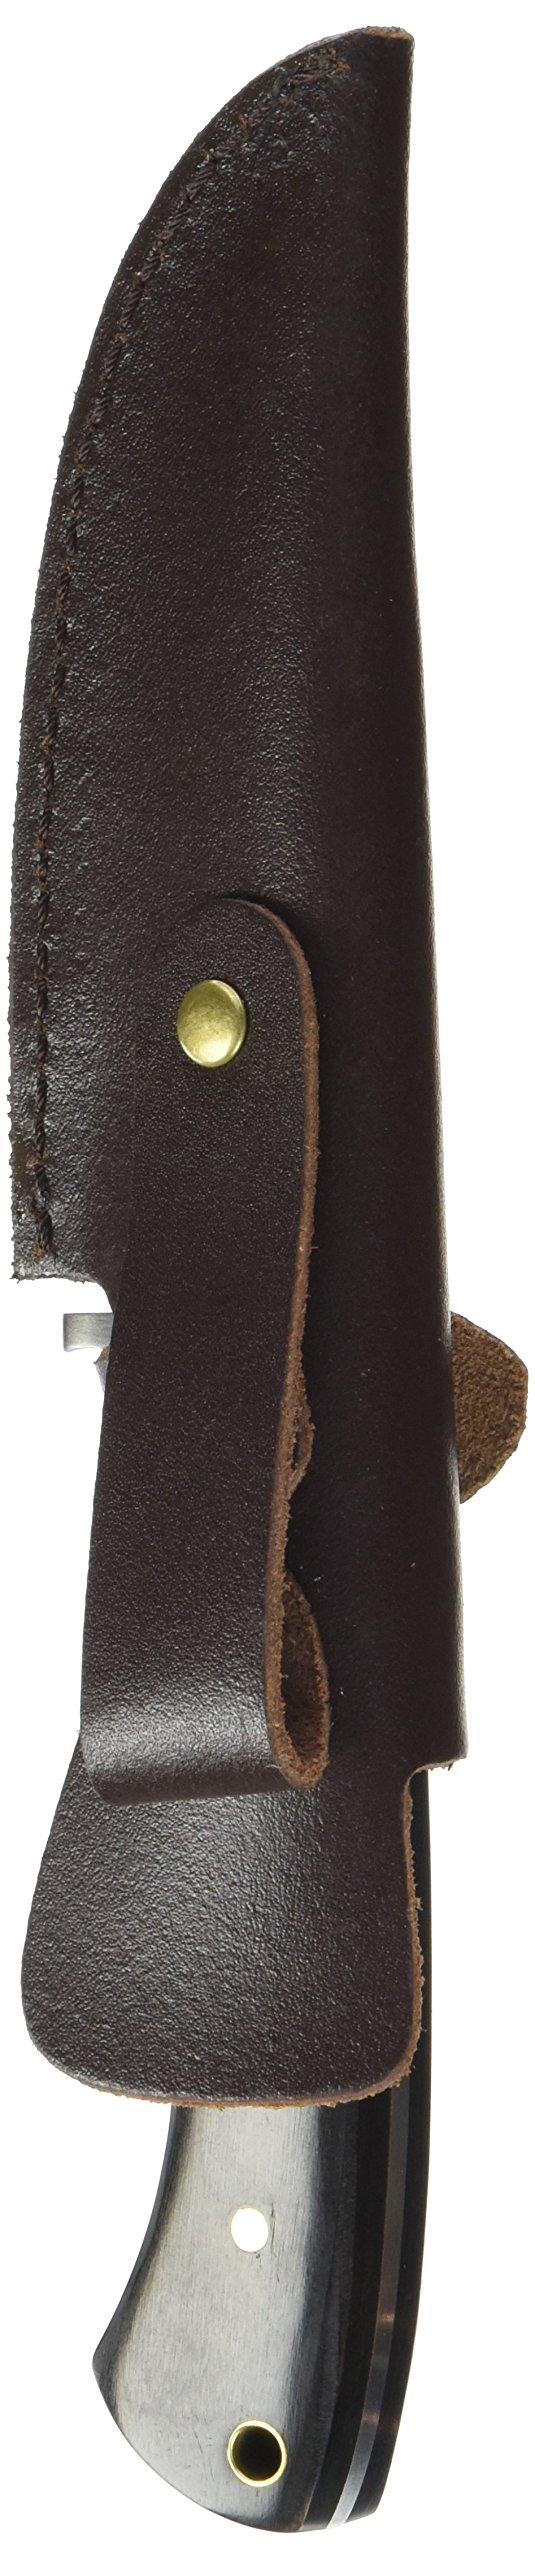 Elk Ridge ER-087 Outdoor Fixed Blade Knife 8.5-Inch Overall